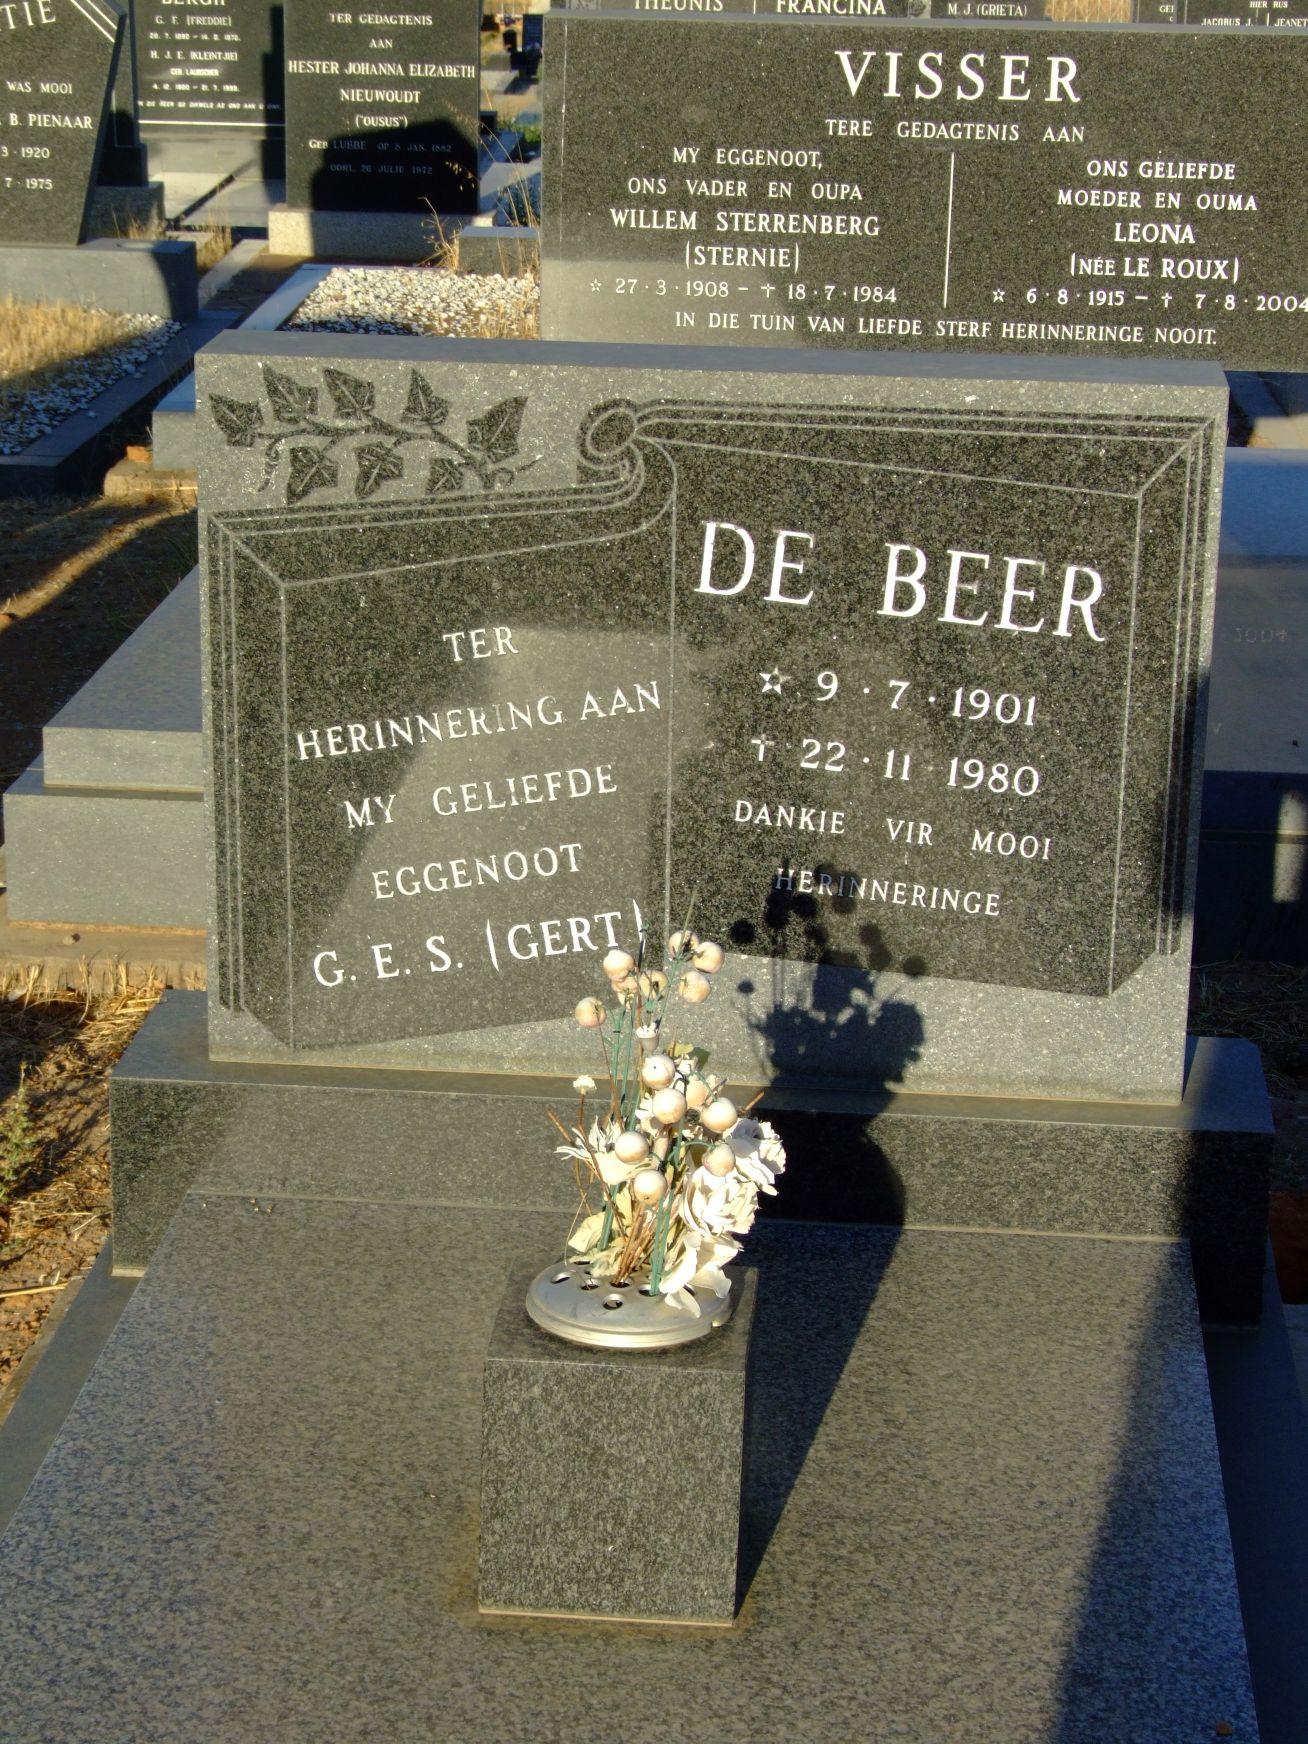 De Beer, G E S